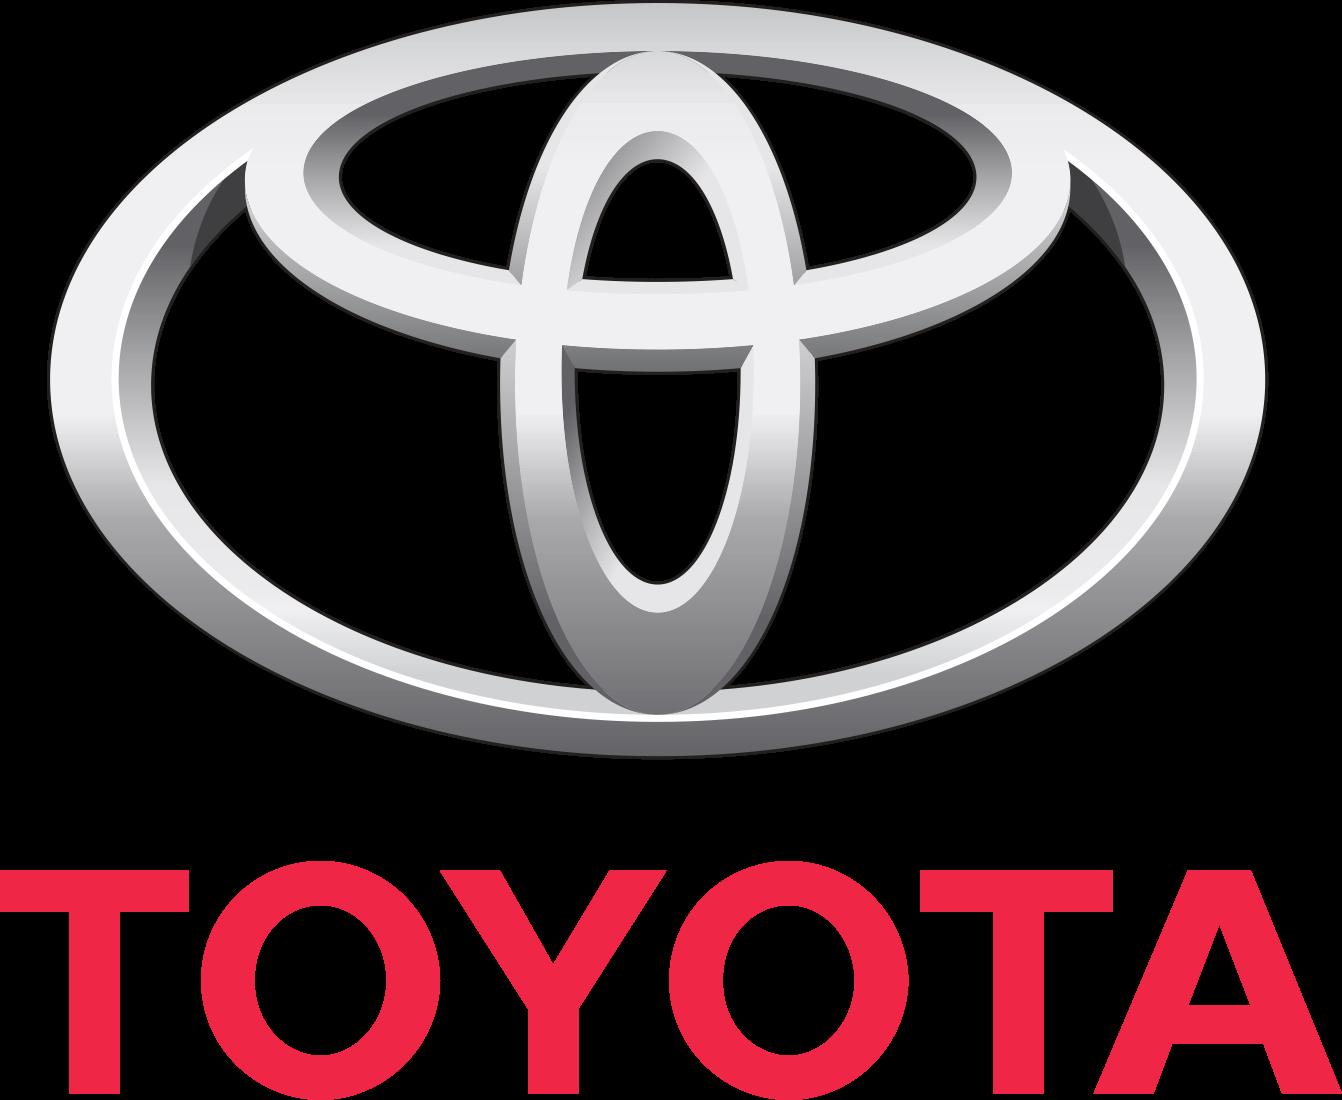 Free toyota logo vector